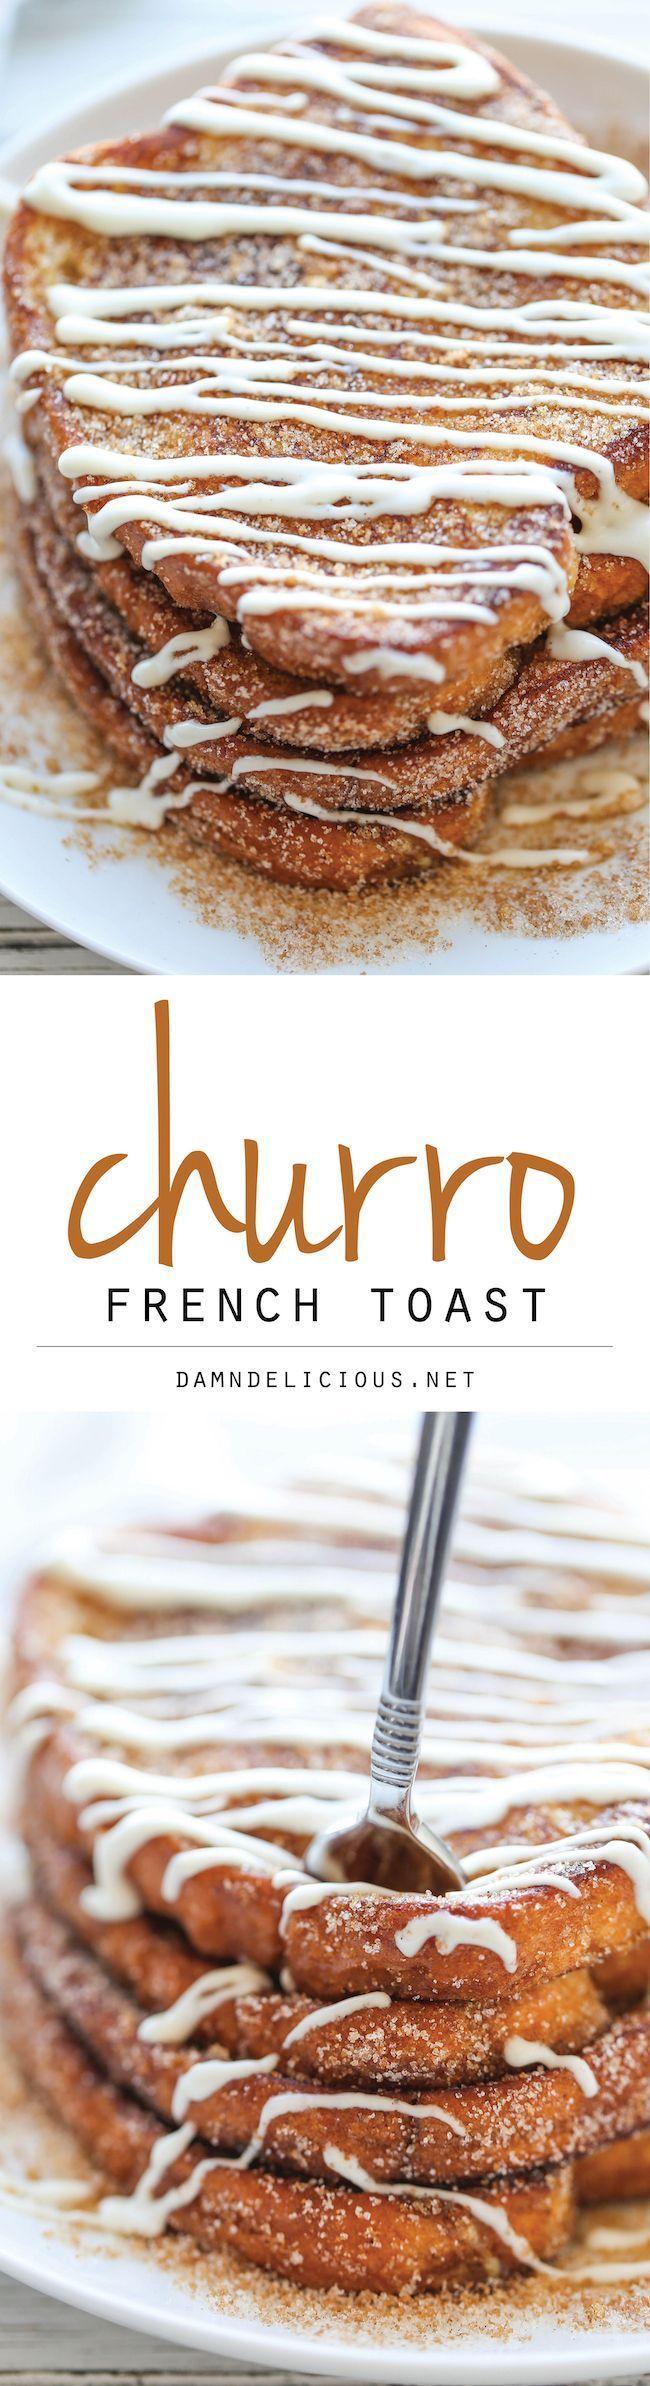 61 best churros images on Pinterest   Desert recipes, Churros and ...